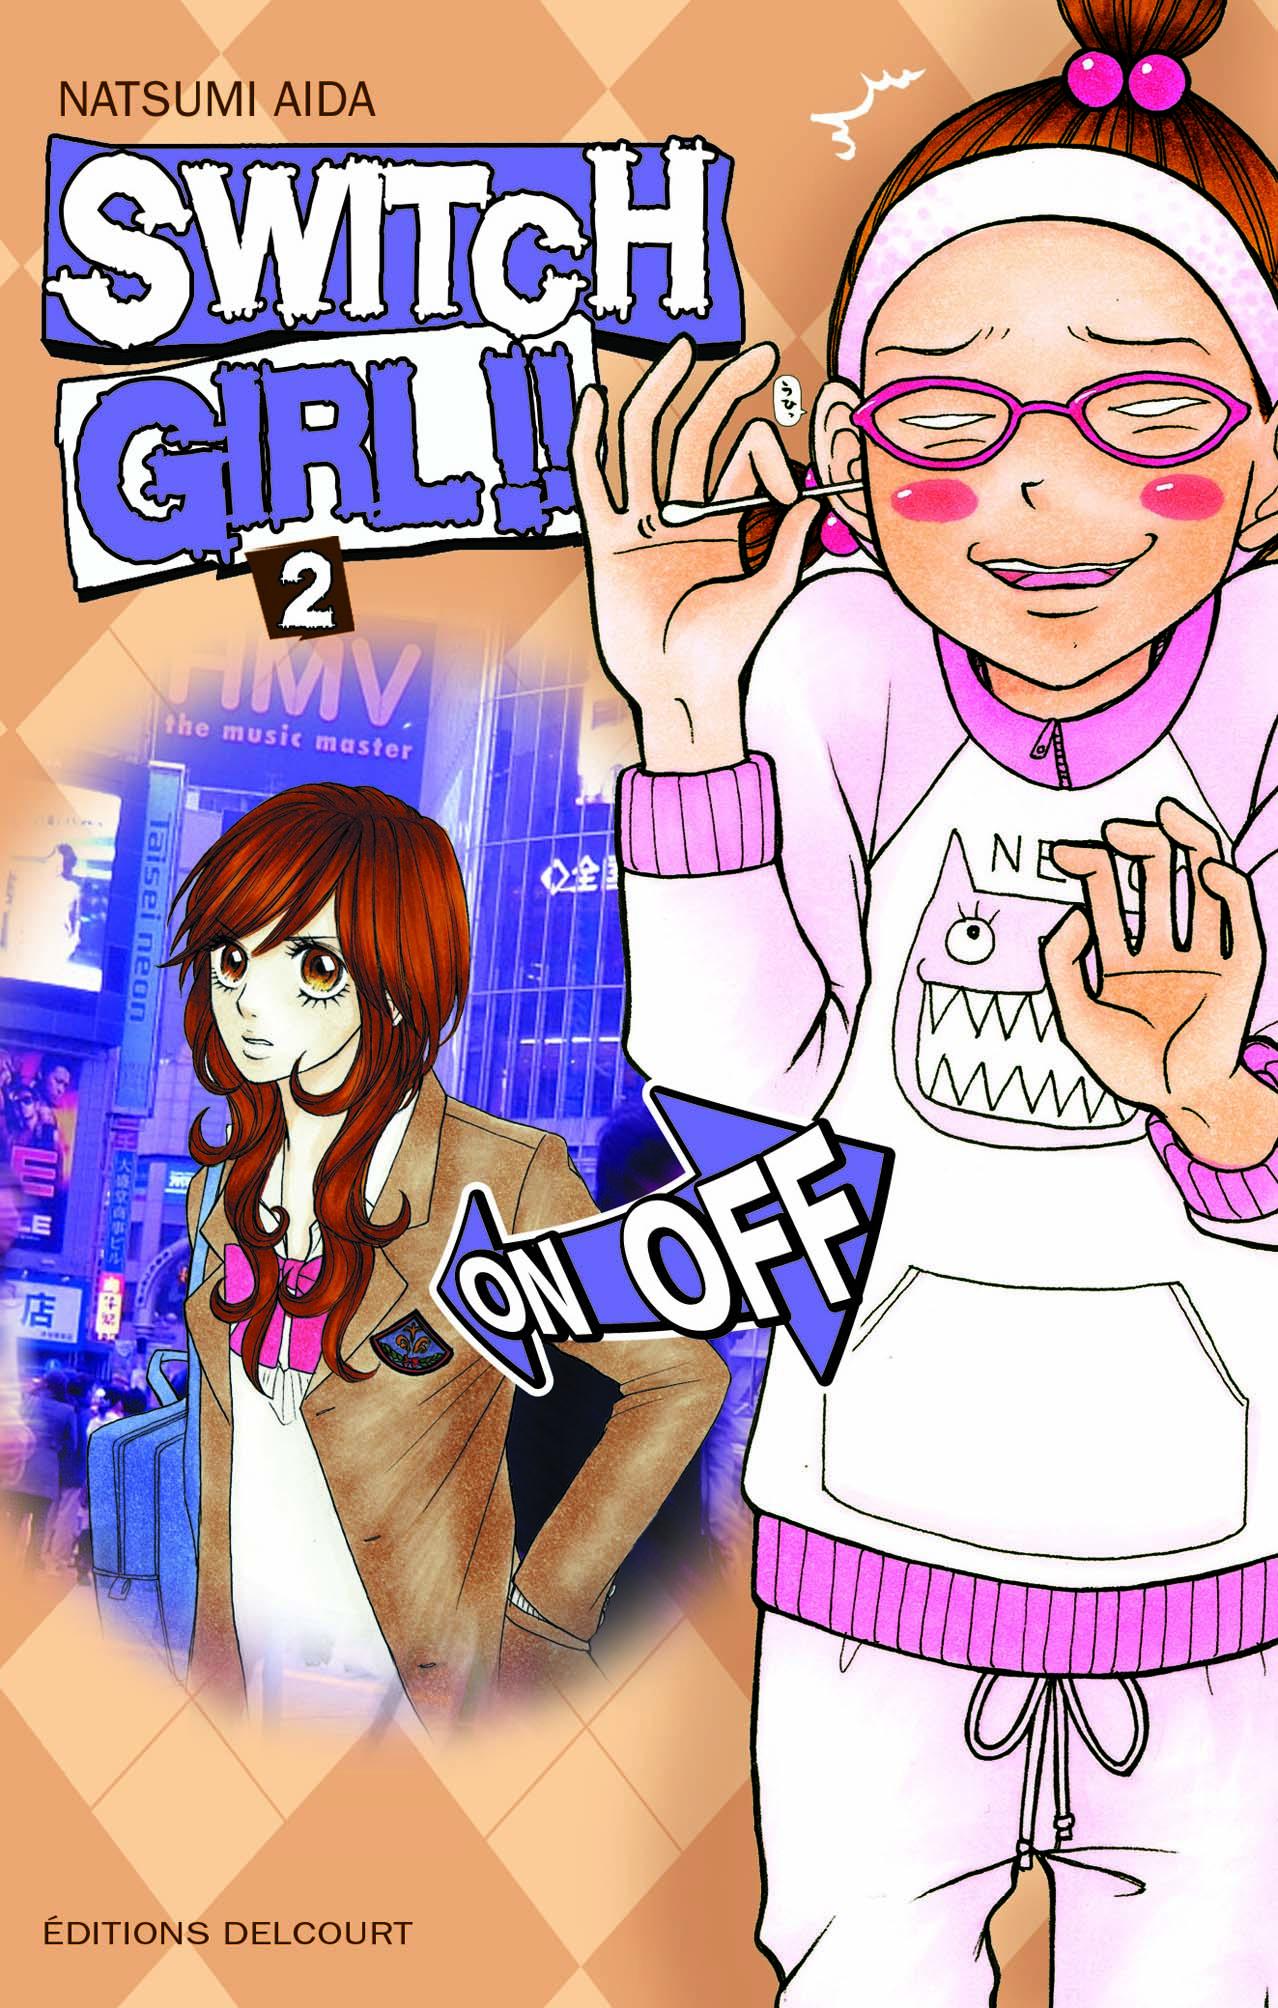 Switch Girl !! 2